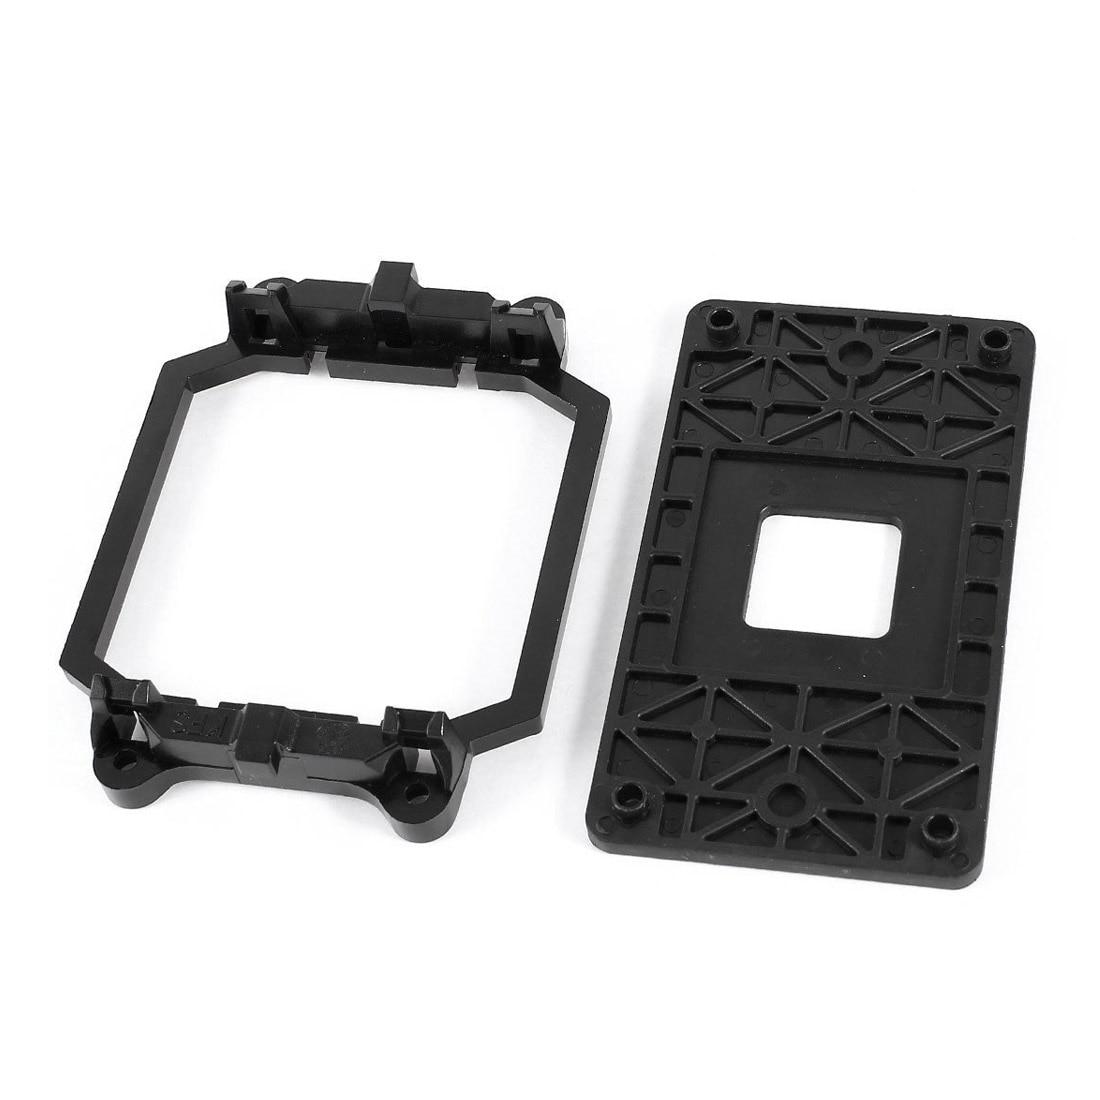 For AMD CPU Fan Base Black Plastic for AM2 AM3 SocketFor AMD CPU Fan Base Black Plastic for AM2 AM3 Socket